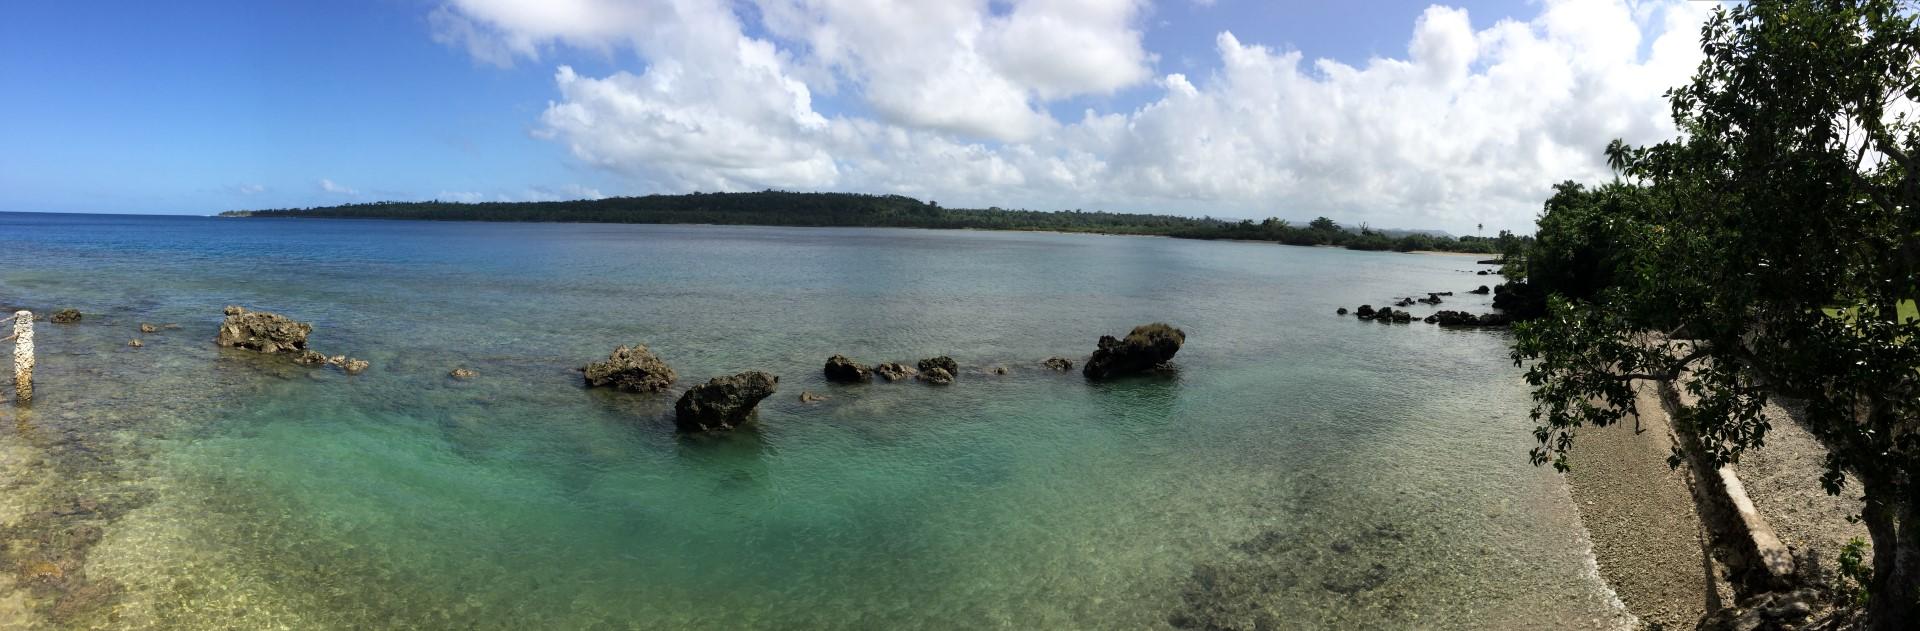 VK5GR's Island Radio Adventures